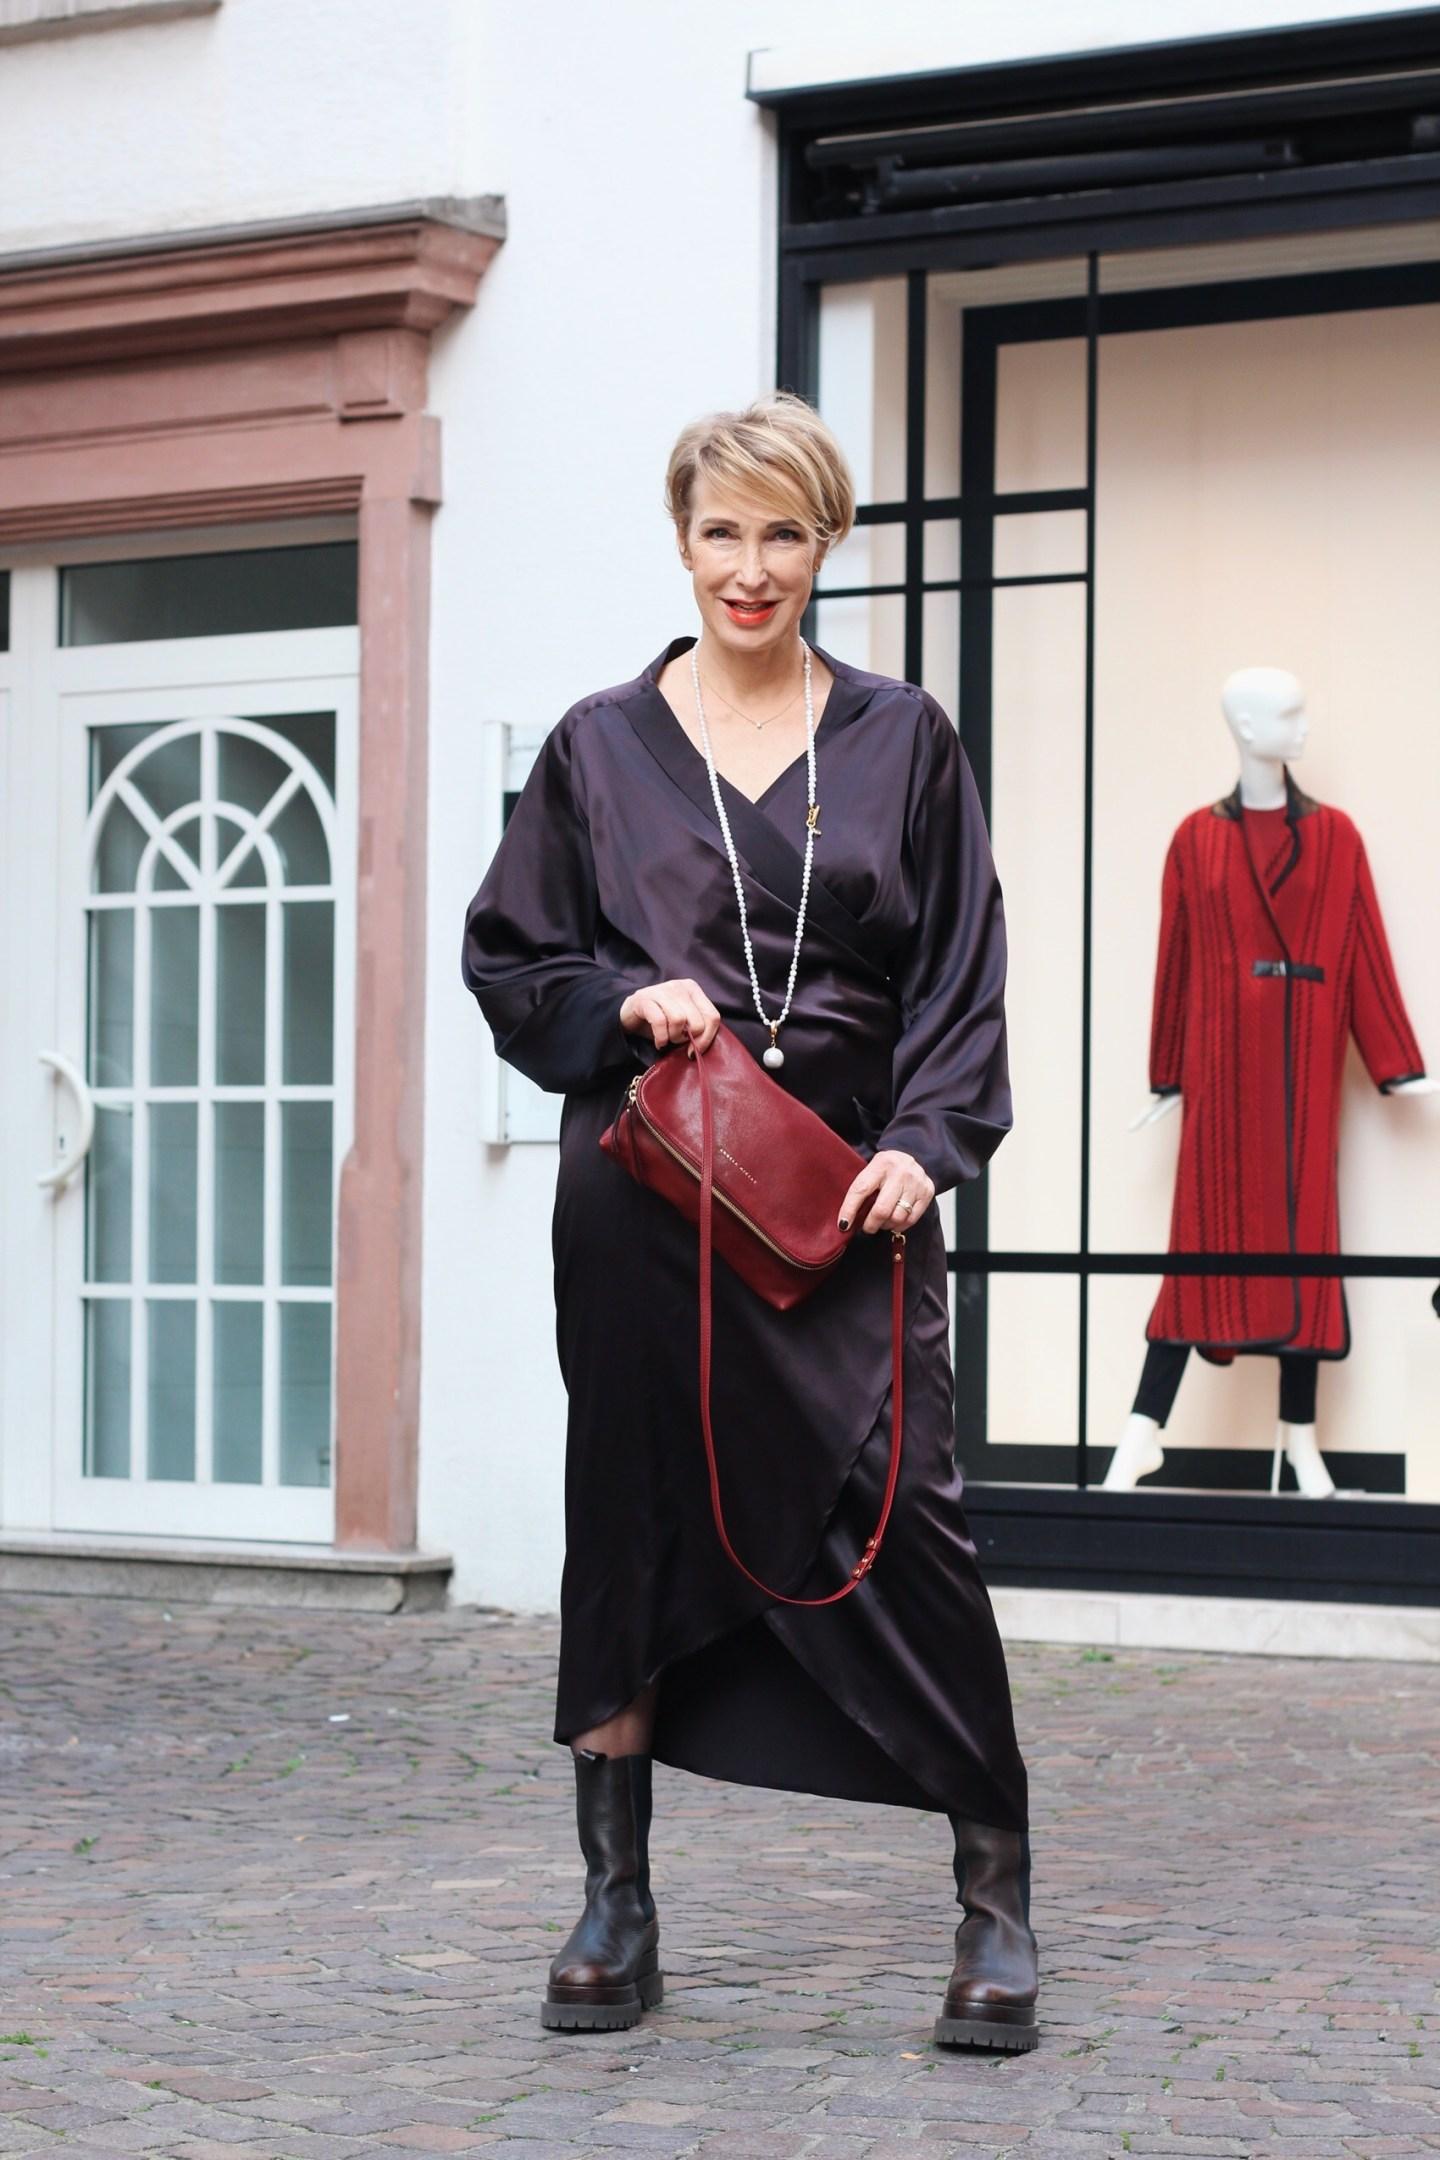 glamupyourlifestyle ü40 Blogger Influencer Netti Weber Modebranche